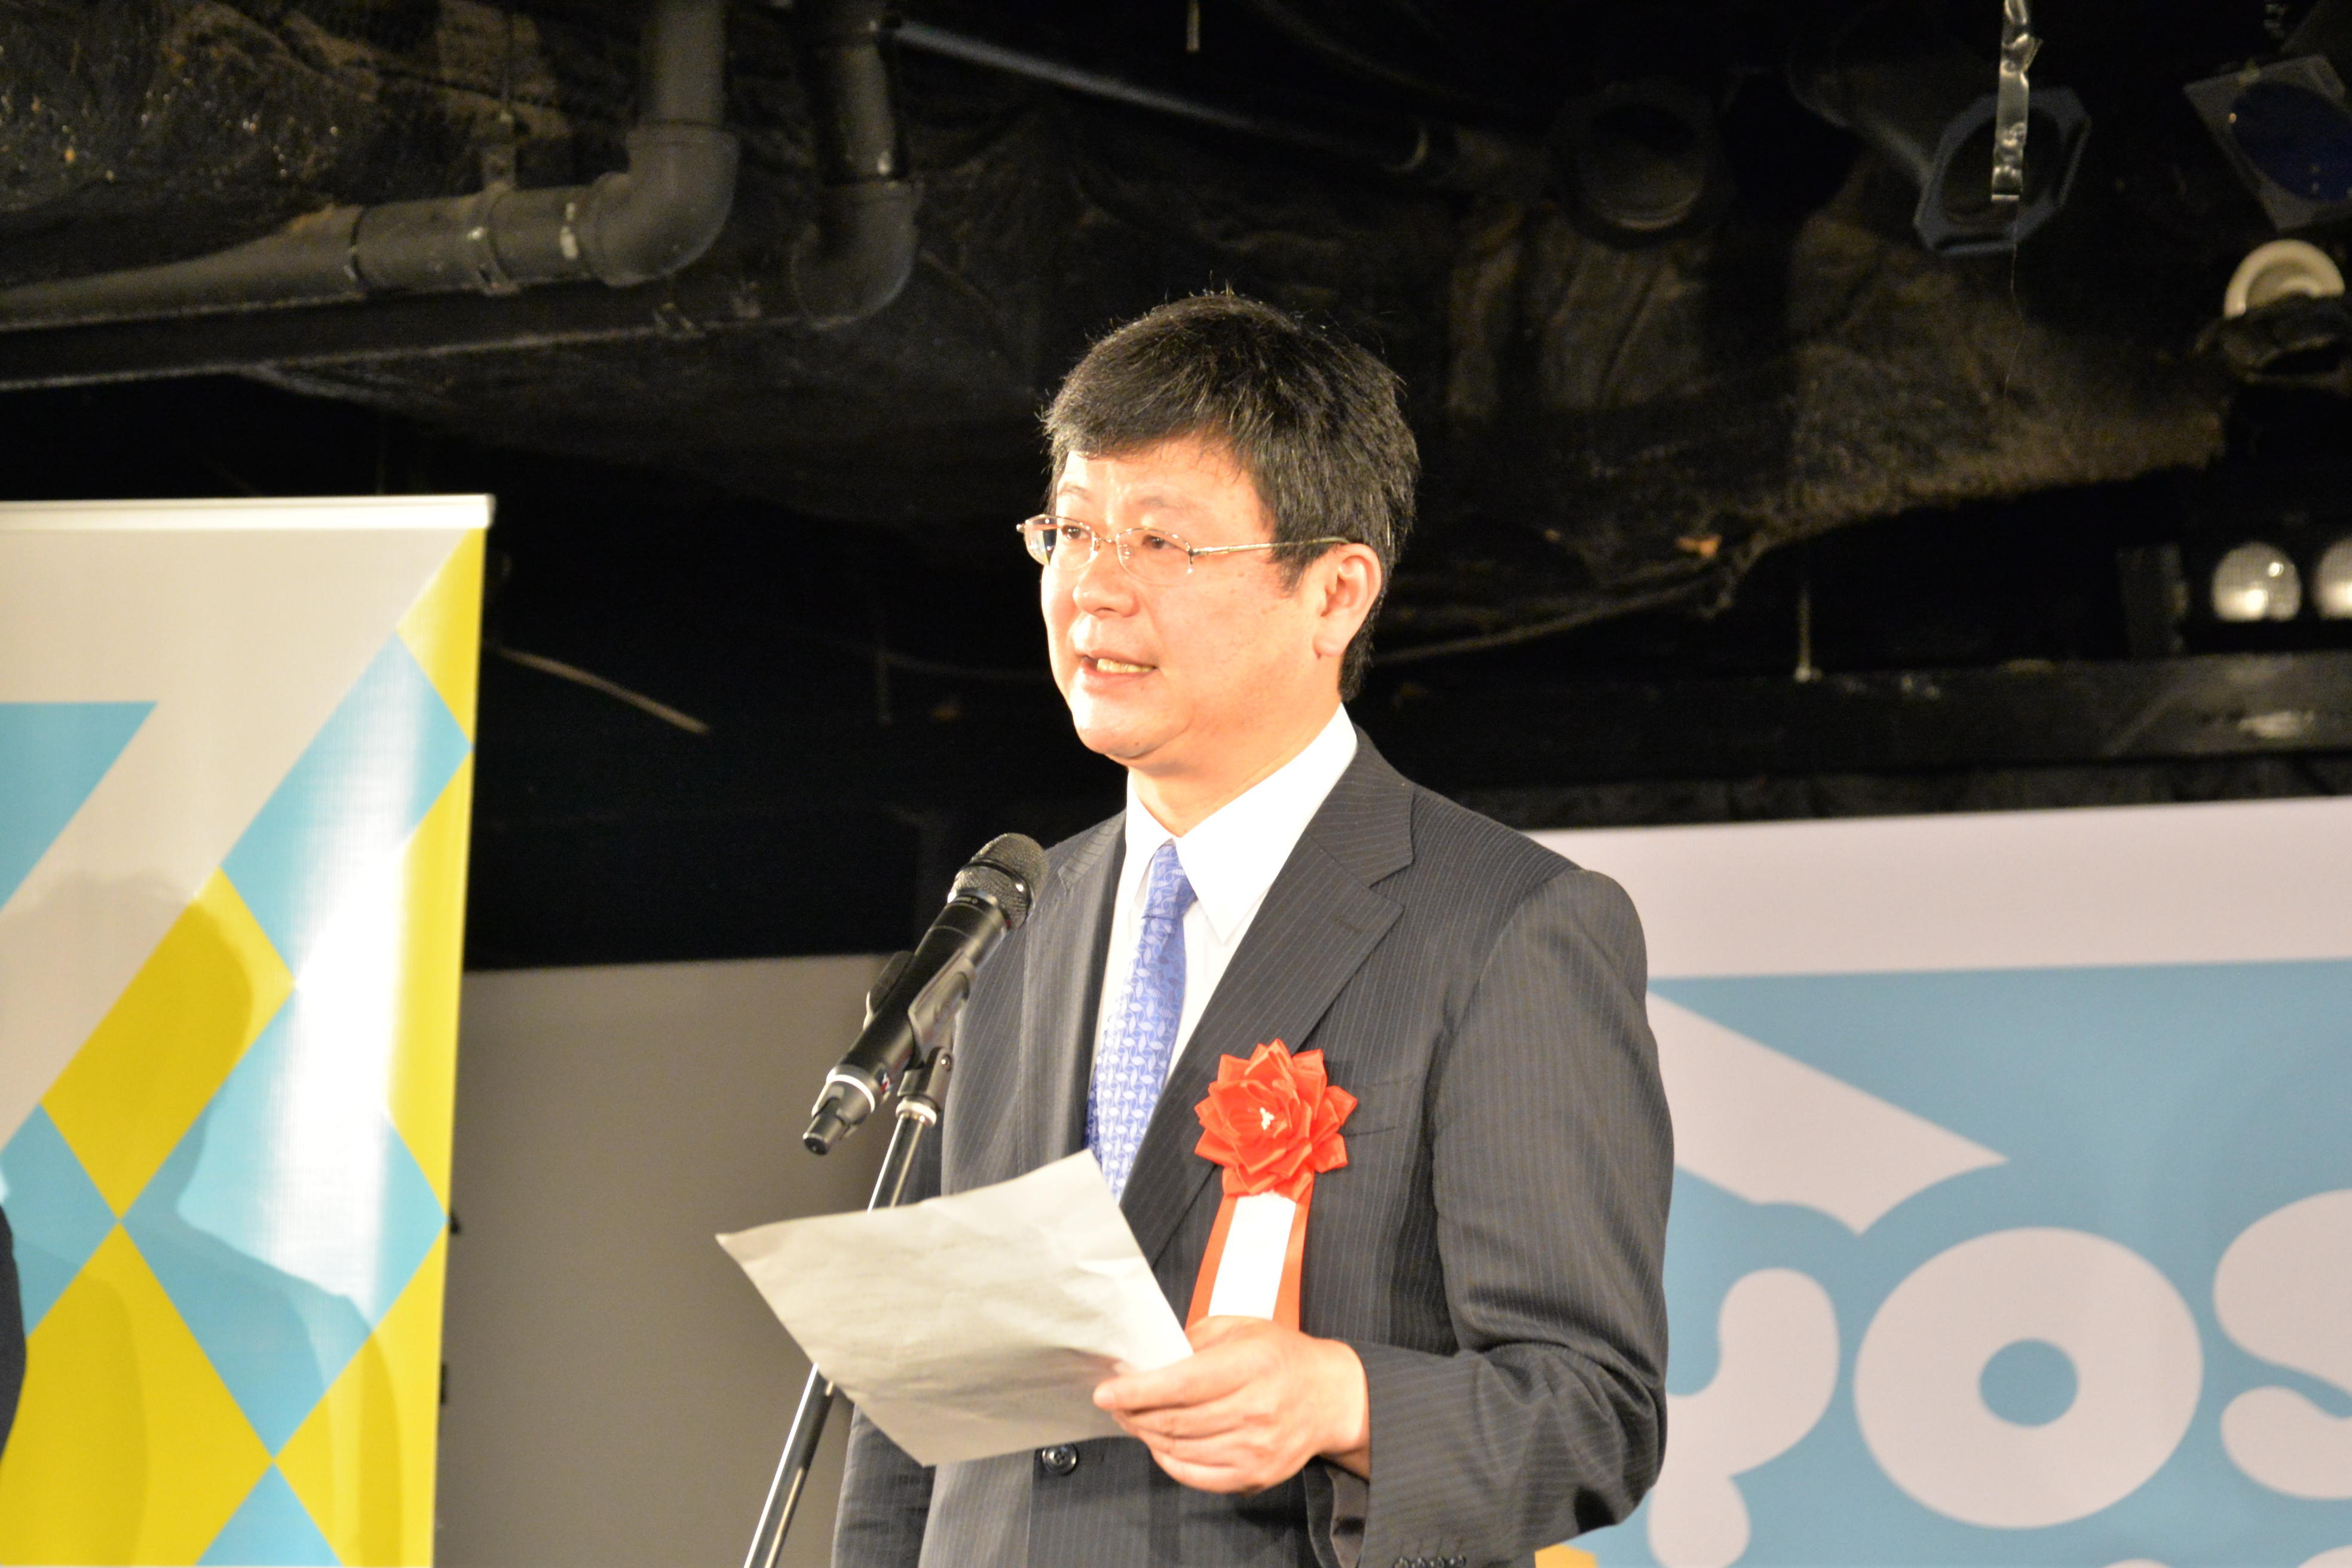 http://news.yoshimoto.co.jp/20180904160820-88a7a3fc9b4589a2cad535863658cf86daa67c6e.jpg